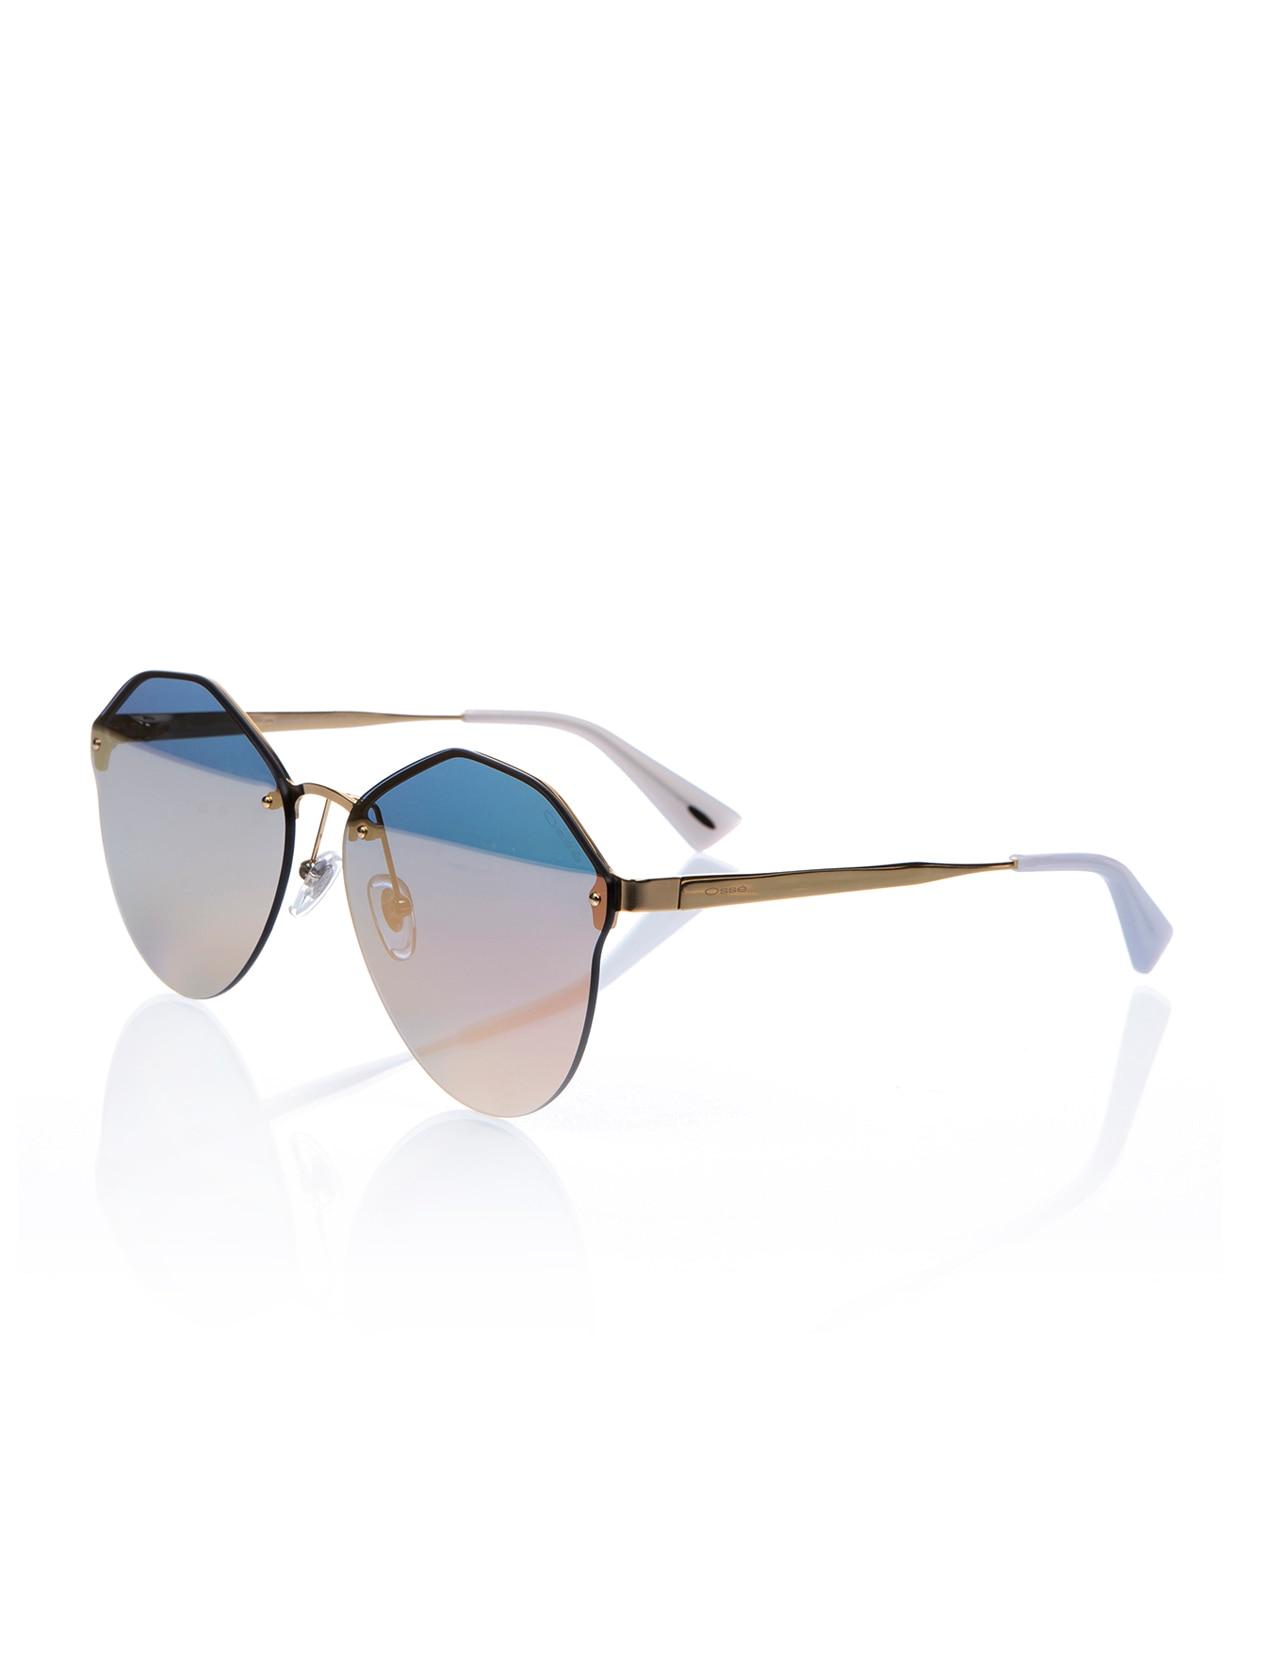 Women's sunglasses os 2674 05 metal gold organic drop aval 59-15-140 osse